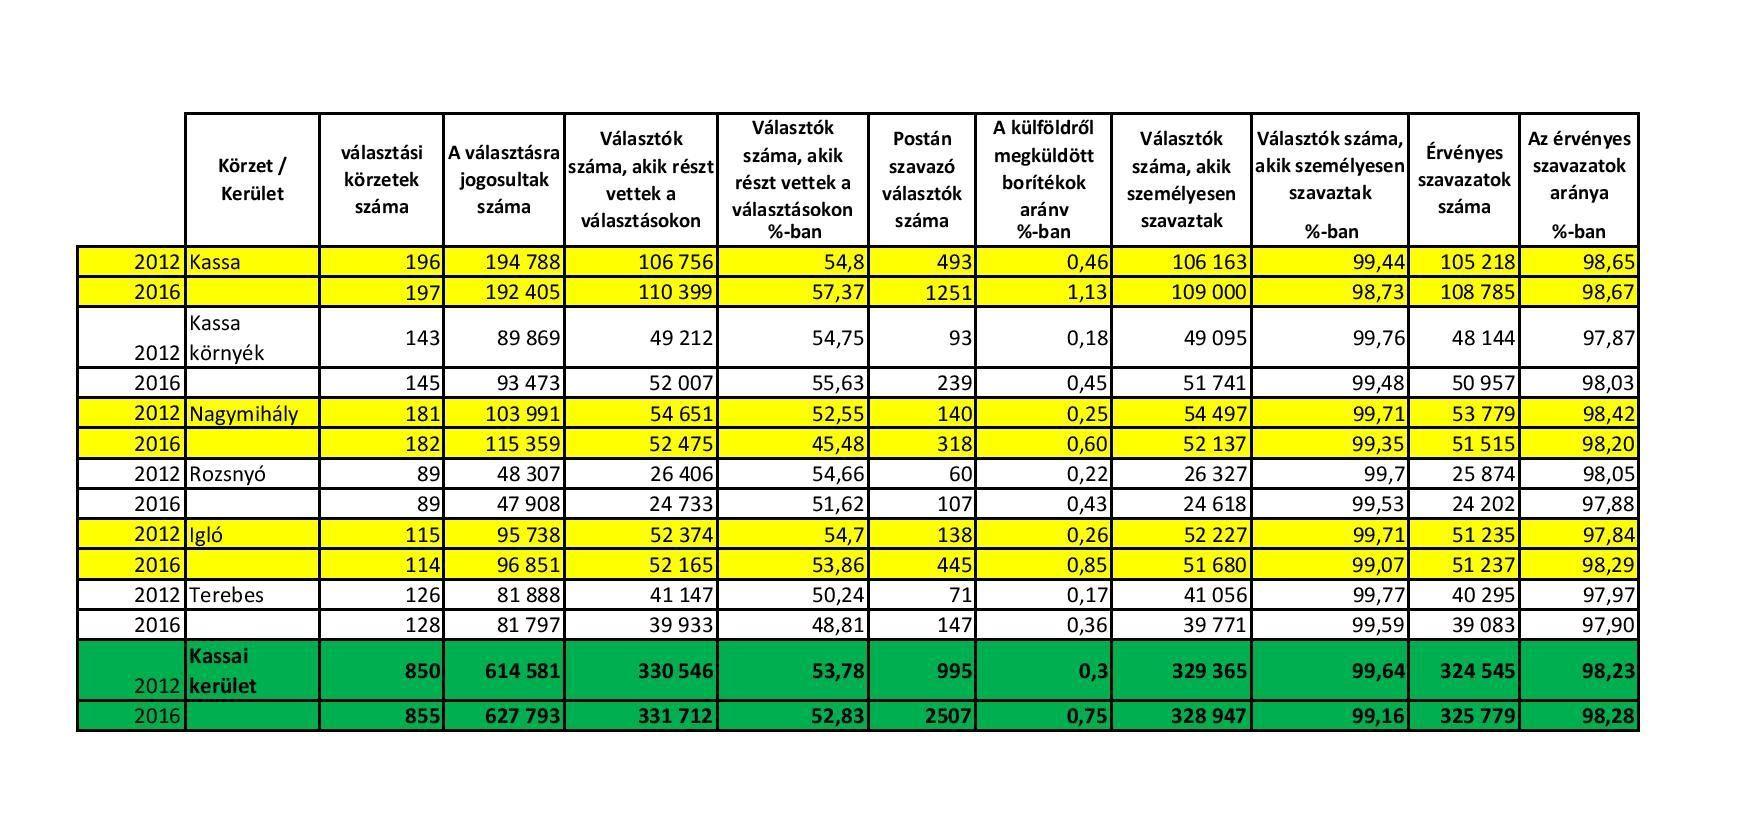 MKP2006-2016 kerületi adatok